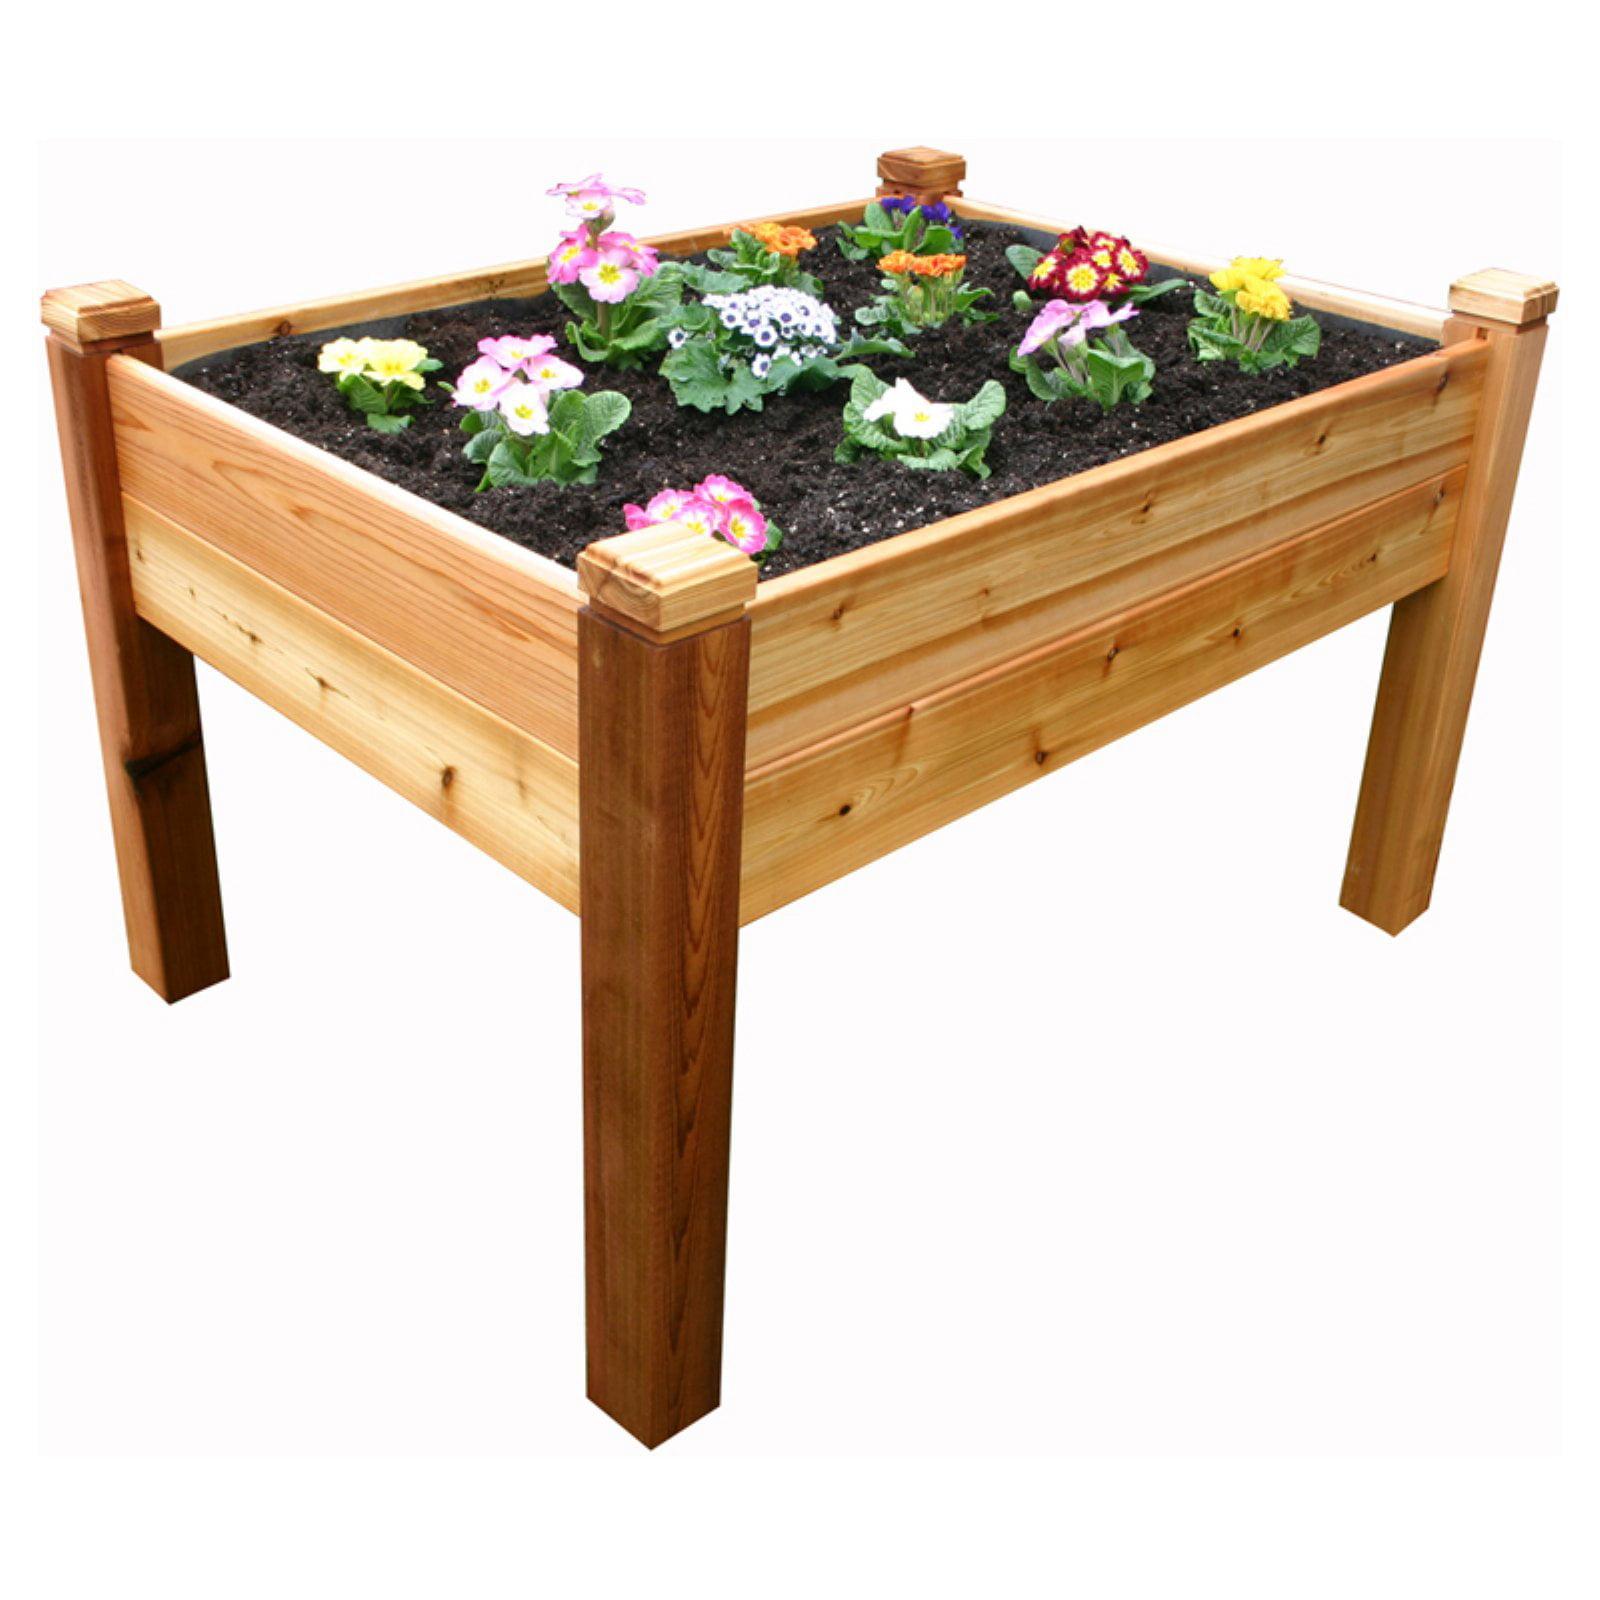 Outdoor Living Today Raised Garden Bed 4 X 3 Ft